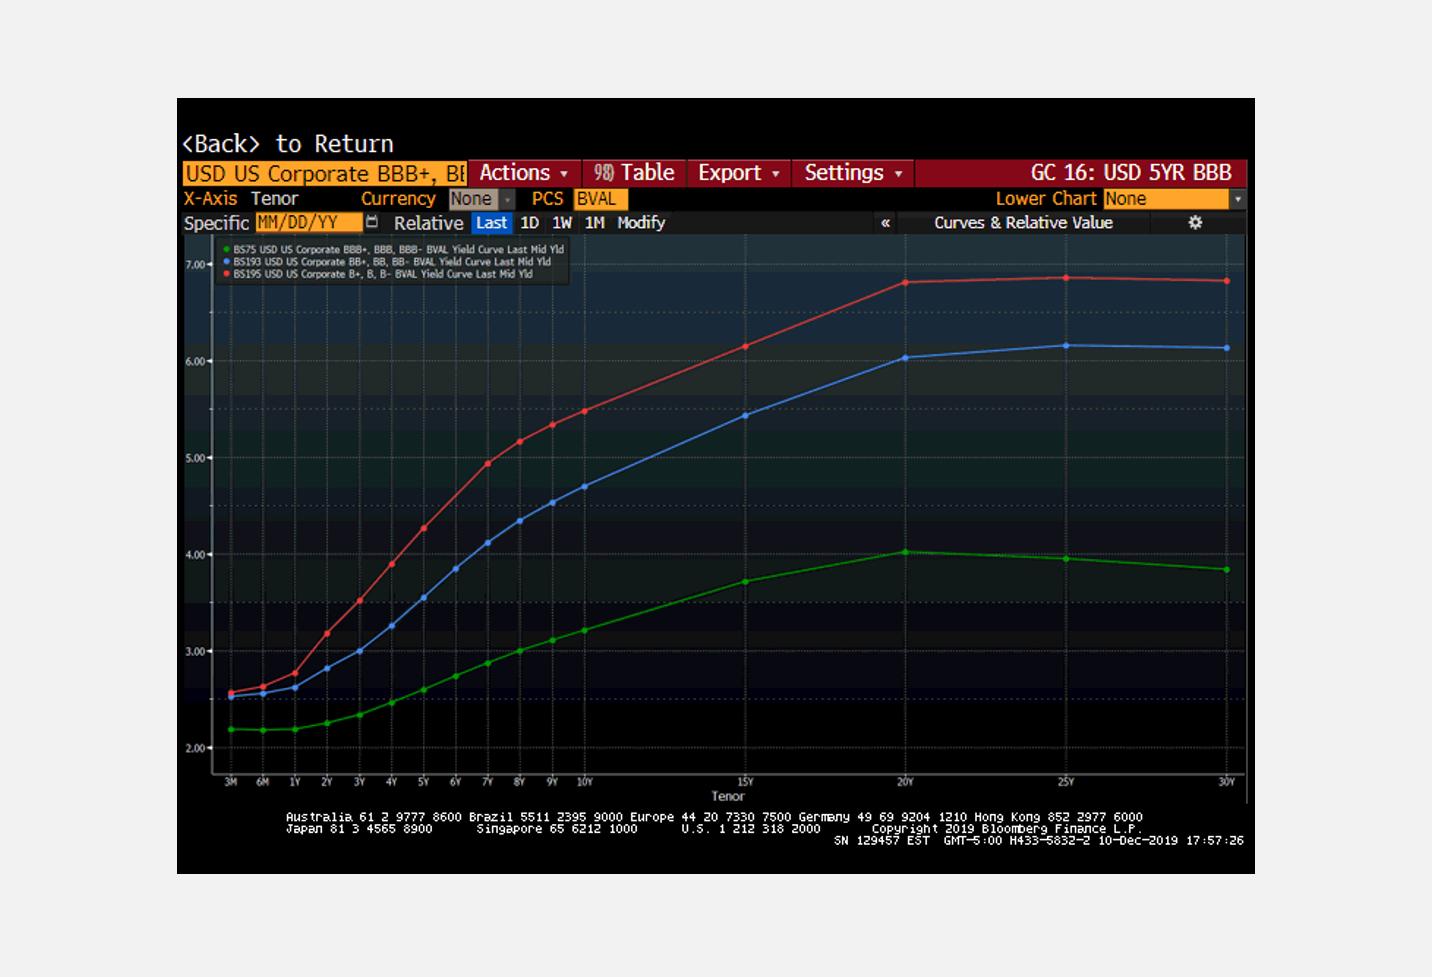 High-Yield Bonds, Subordinated Debt, and Loans thumbnail